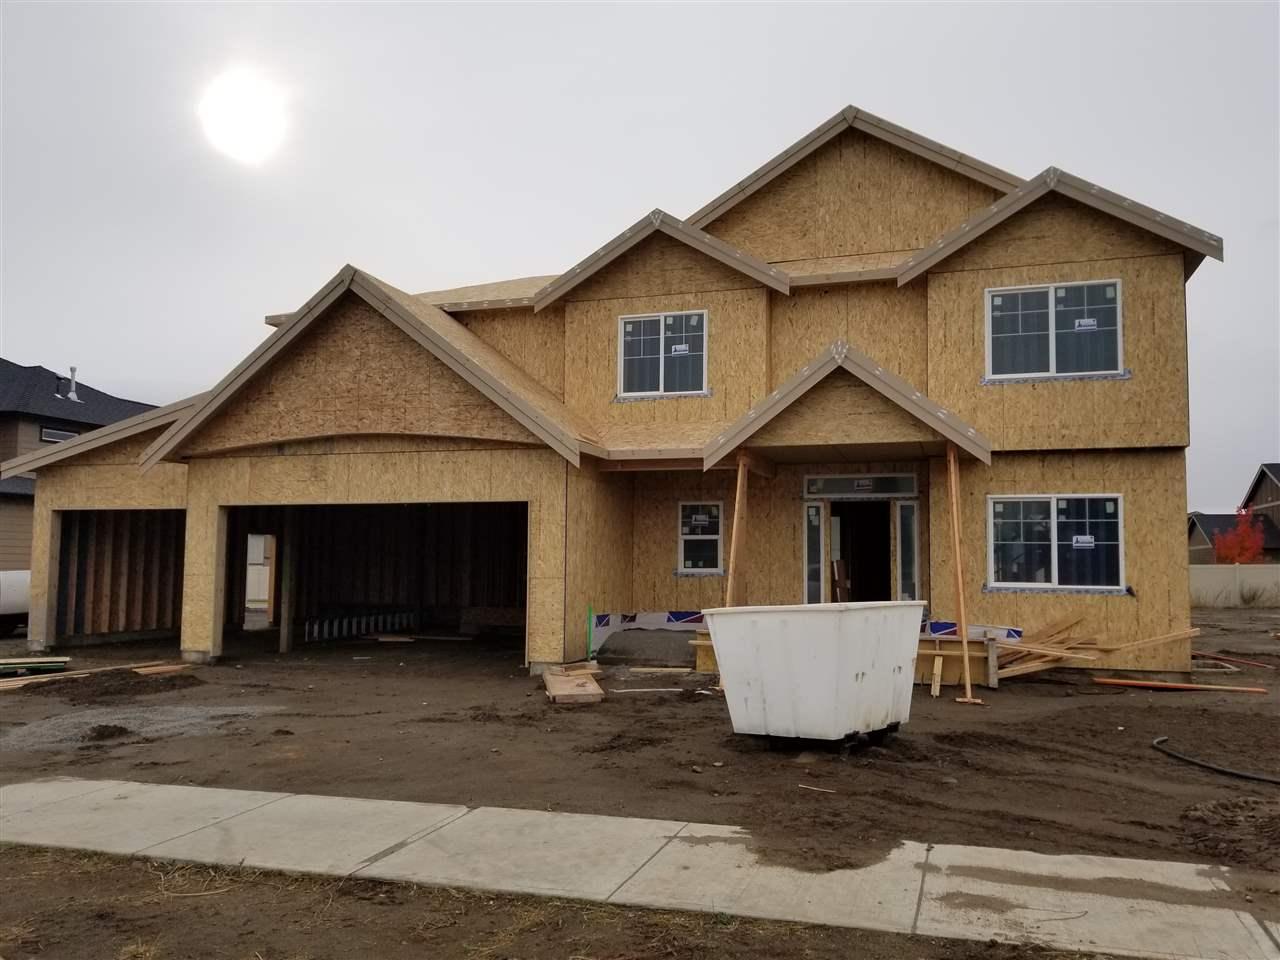 Single Family Home for Sale at 17624 E Belleaire Drive 17624 E Belleaire Drive Greenacres, Washington 99016 United States